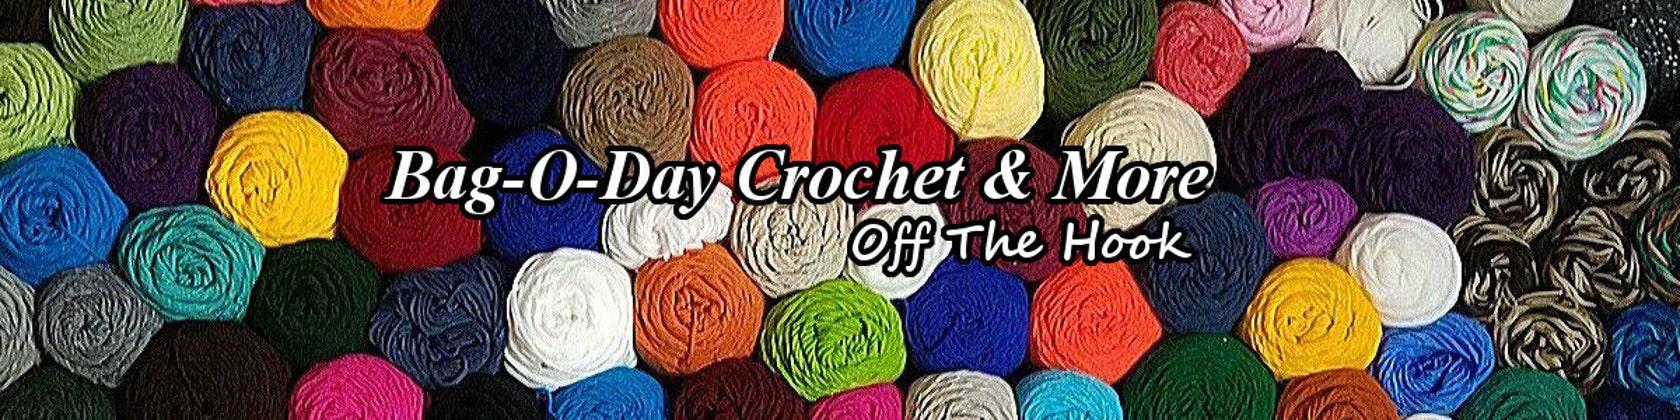 Bagoday Crochet Pattern Shop By Bagodaycrochet On Etsy